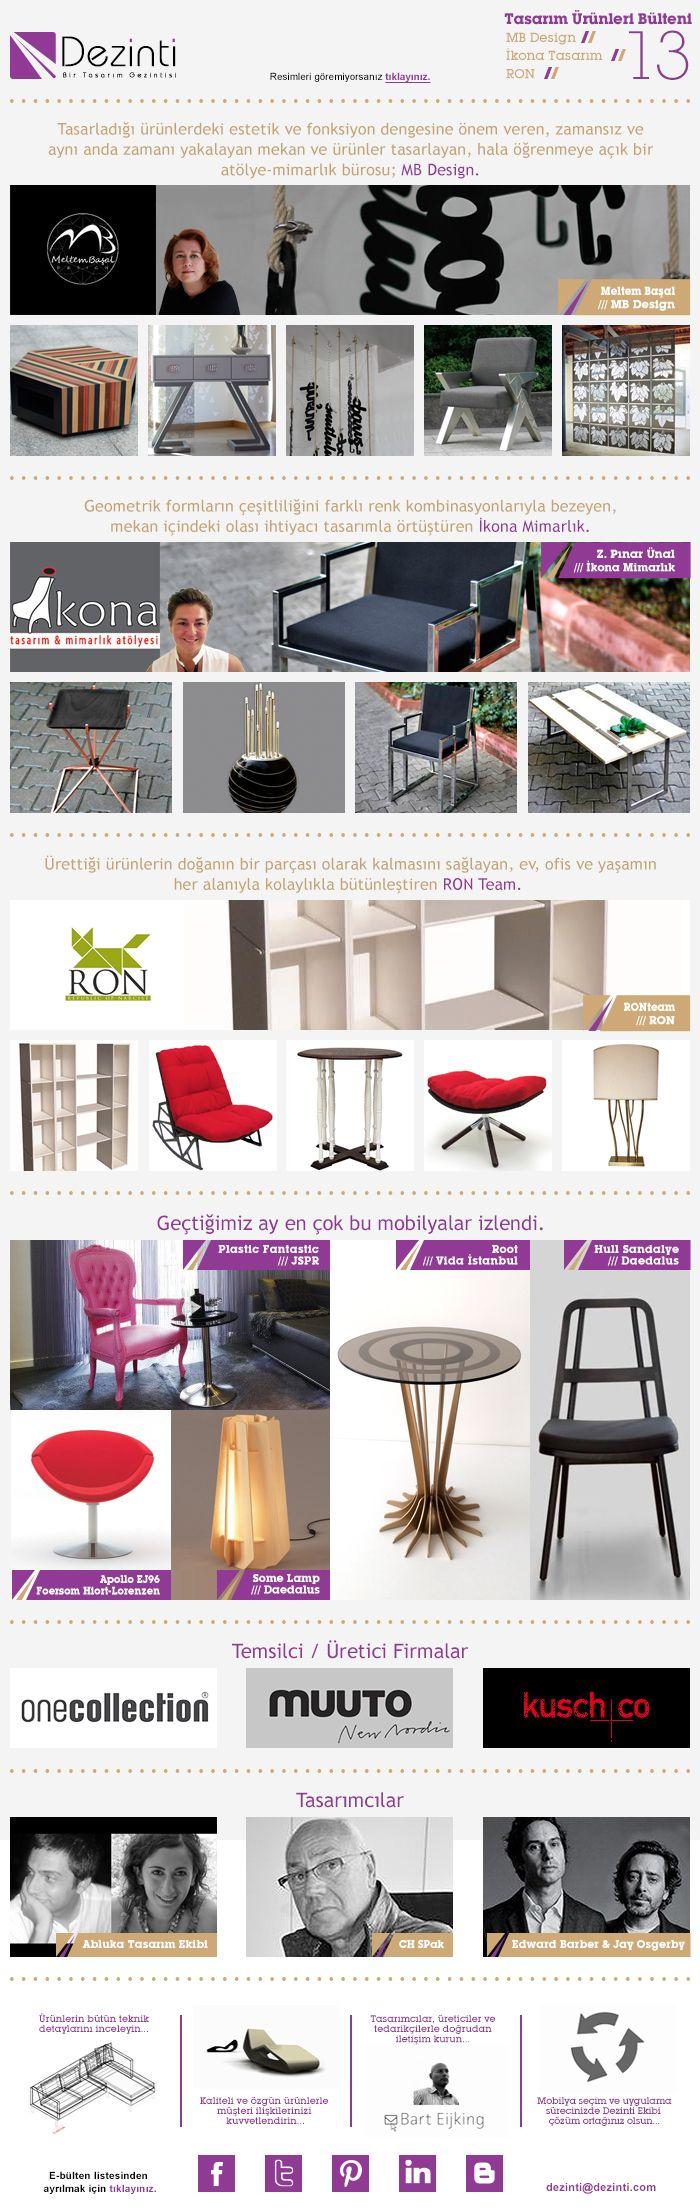 MB Design, İkona Design, Republic of Narcist www.dezinti.com http://bit.ly/1yfHIg9